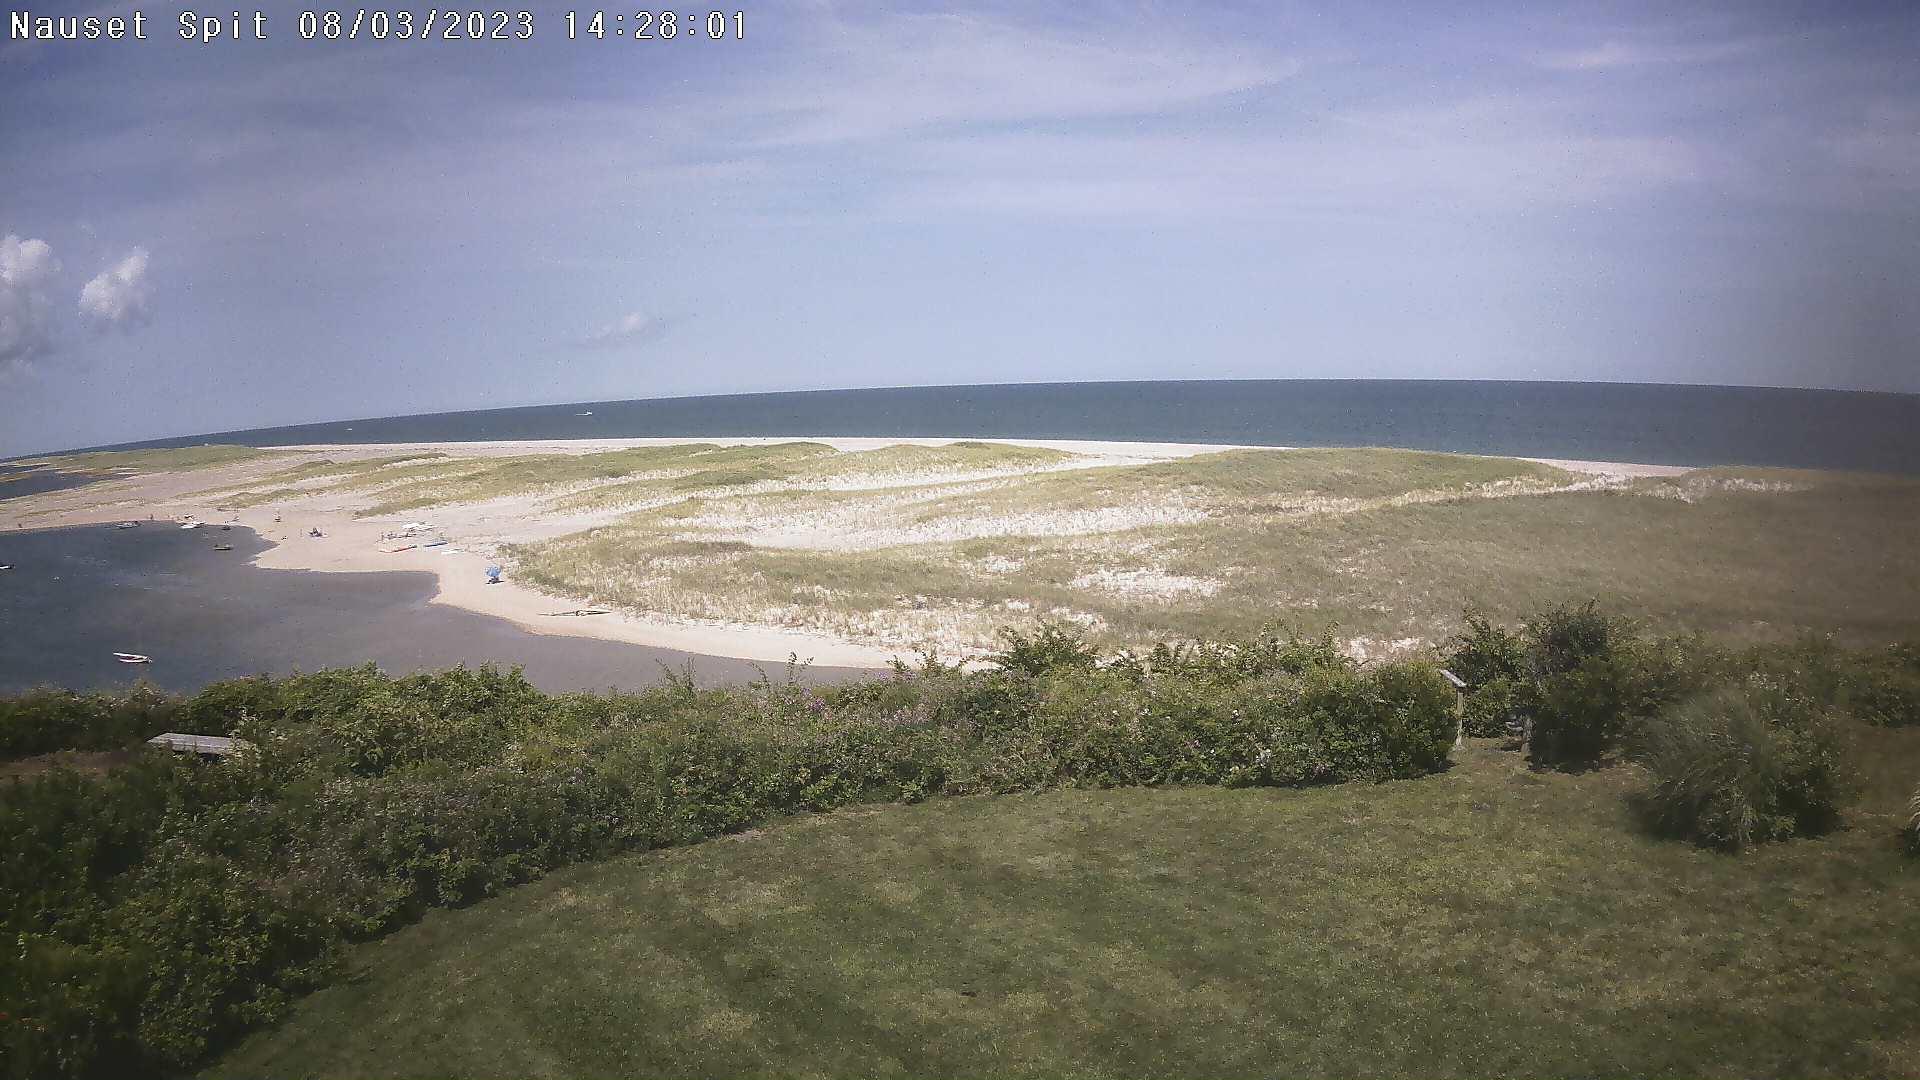 Nauset Beach Webcam